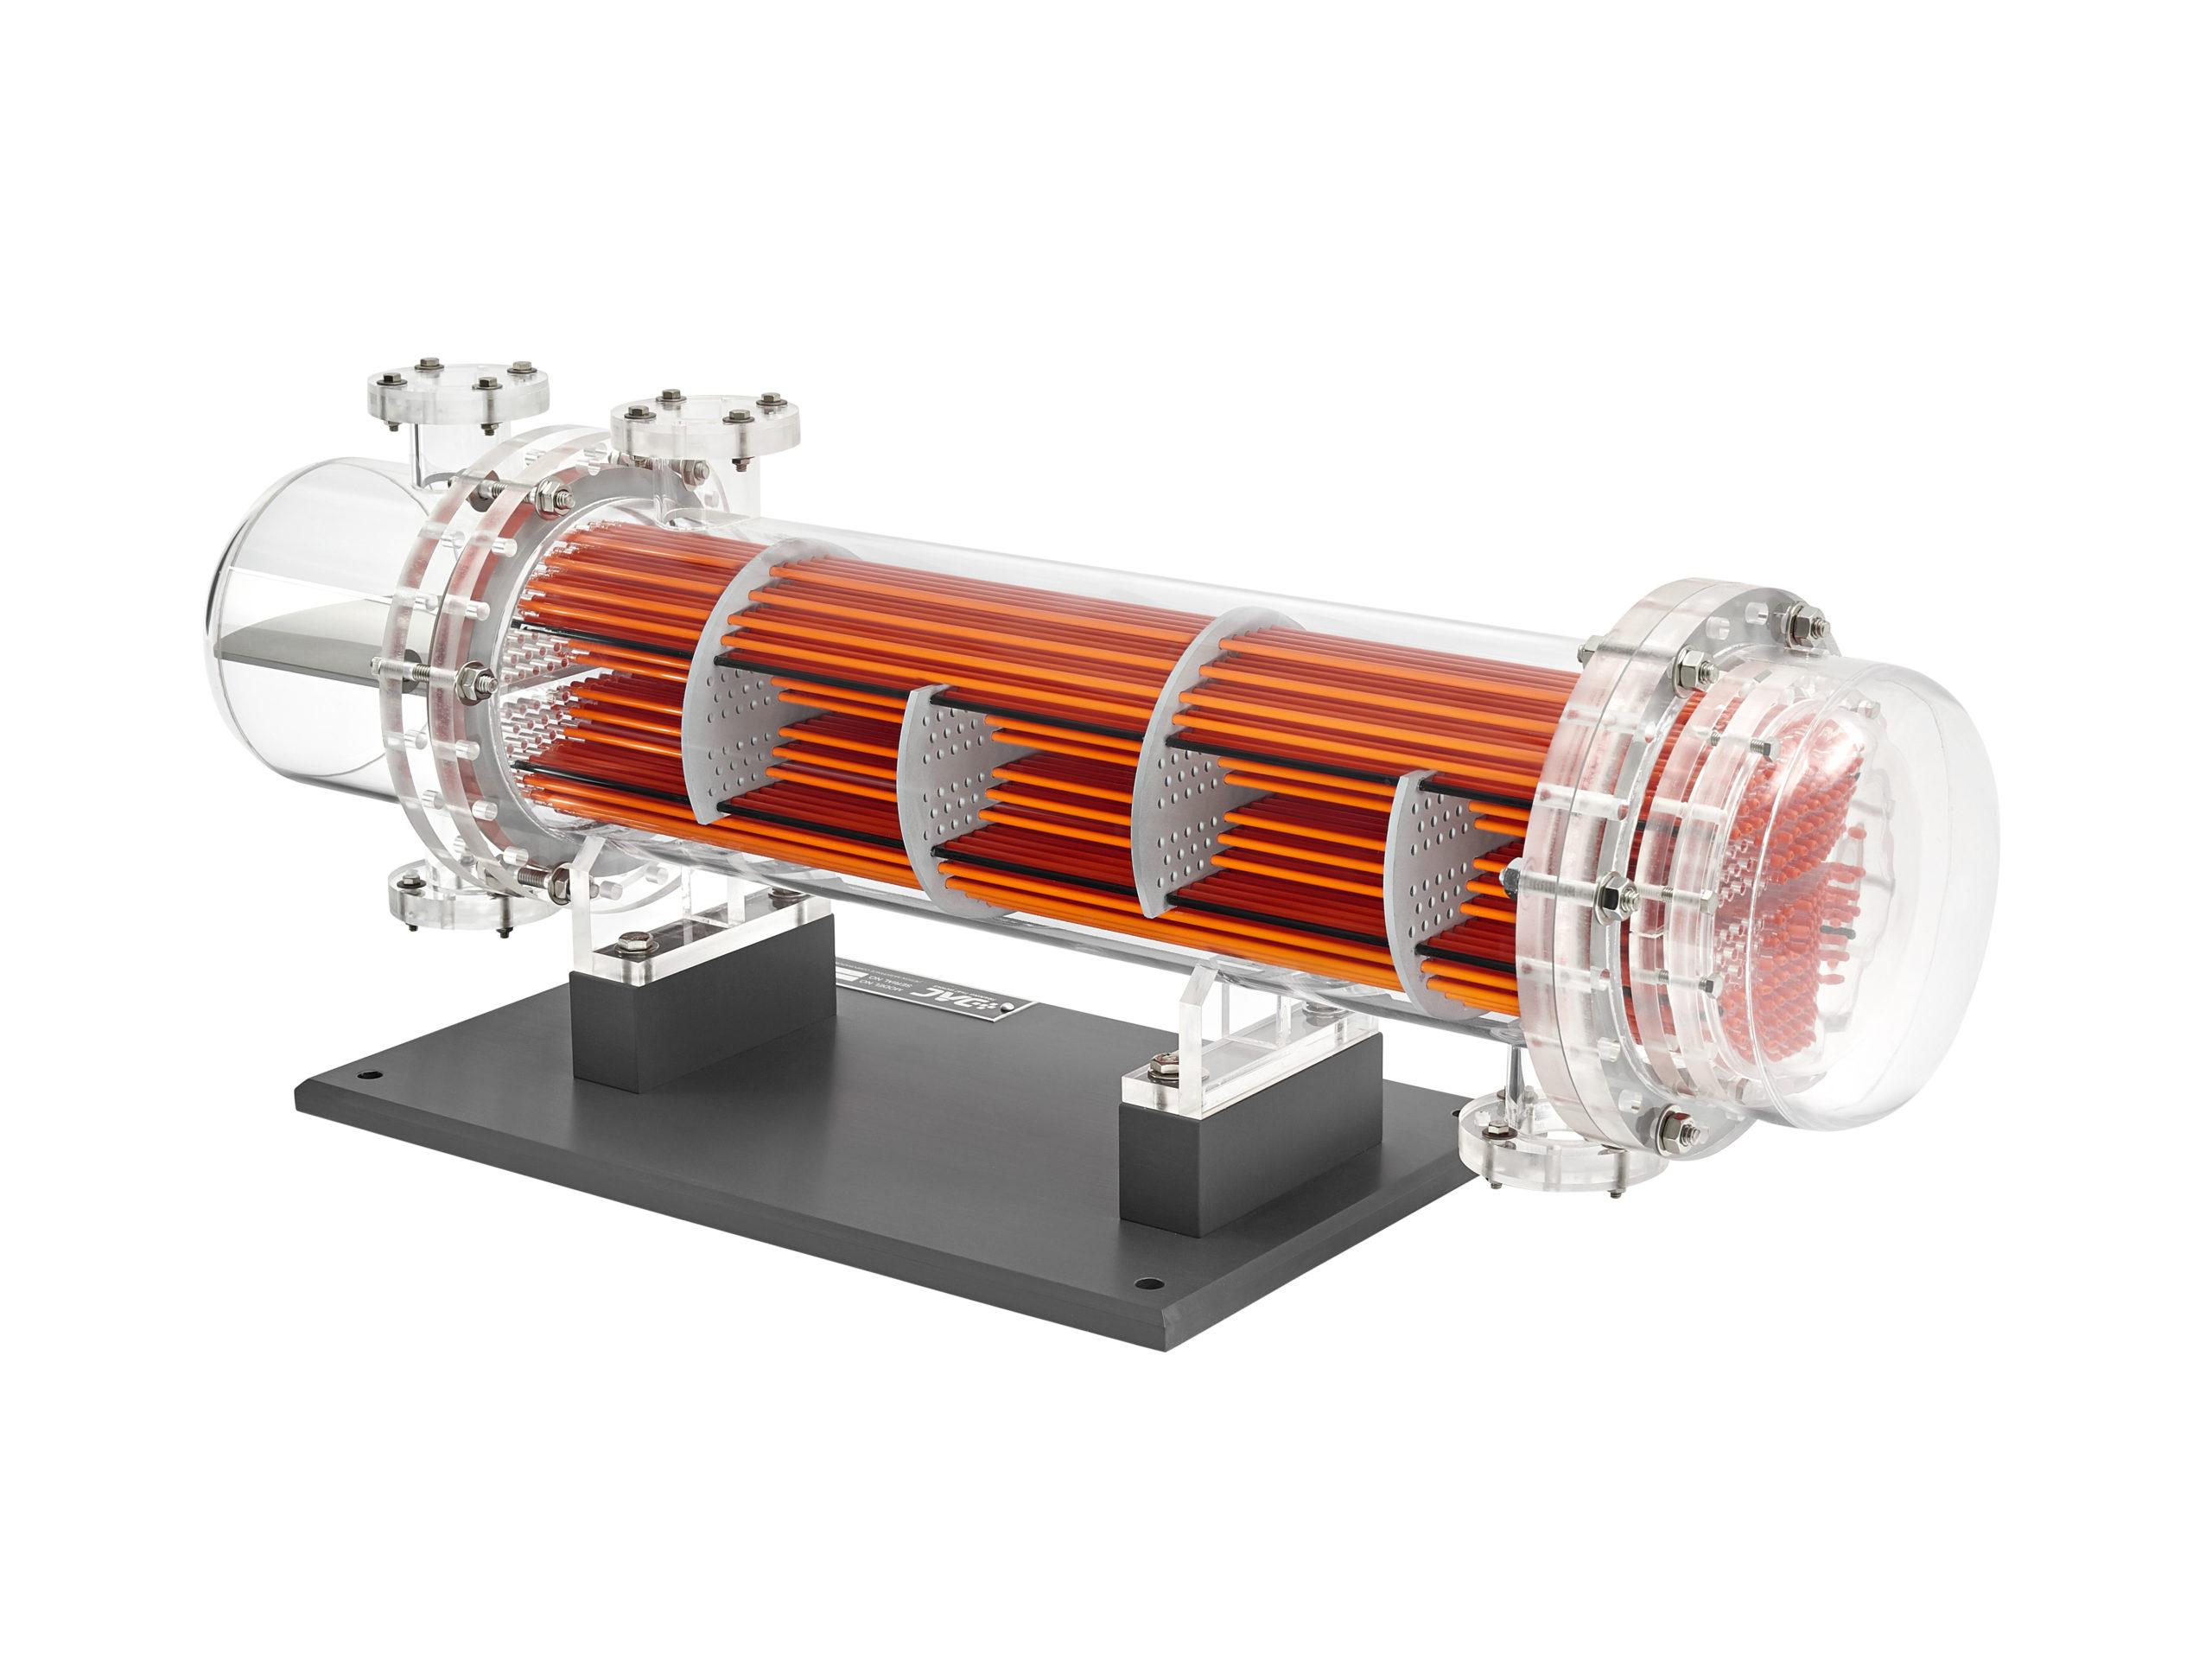 multi-pass floating head heat exchanger